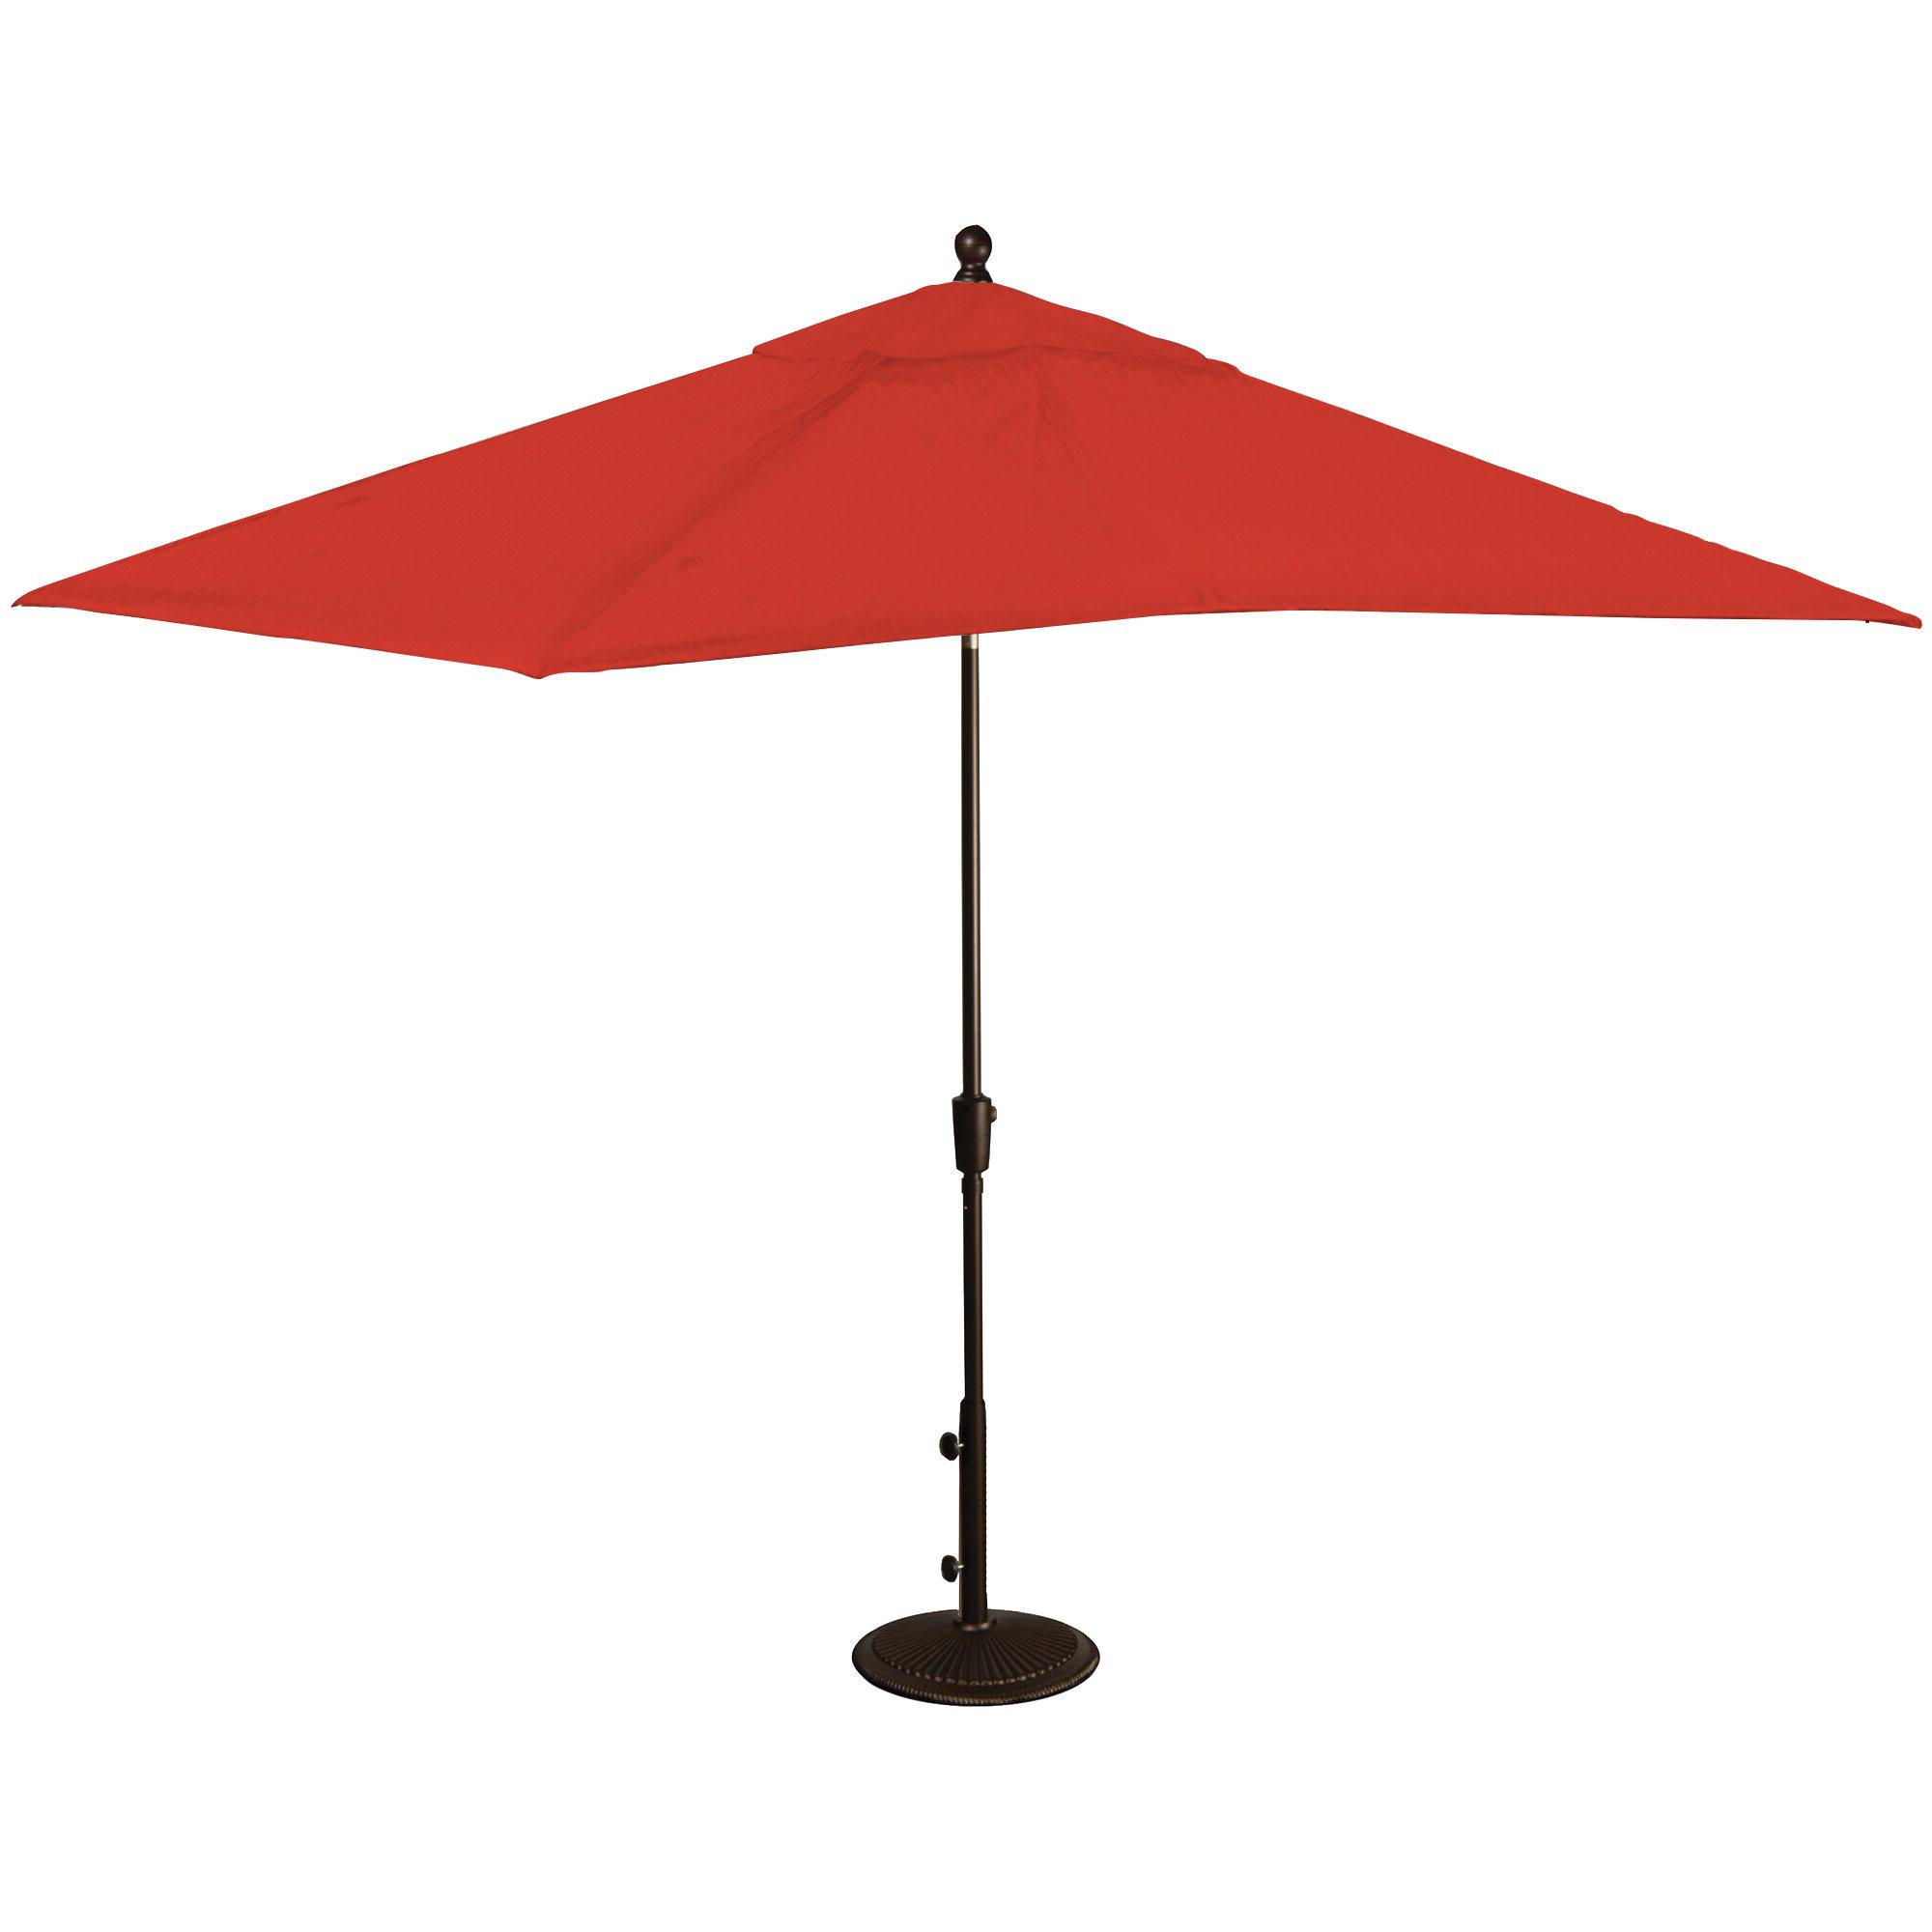 Maglione Fabric 4cantilever Umbrellas In Popular Caspian 8' X 10' Rectangular Market Umbrella (View 4 of 20)